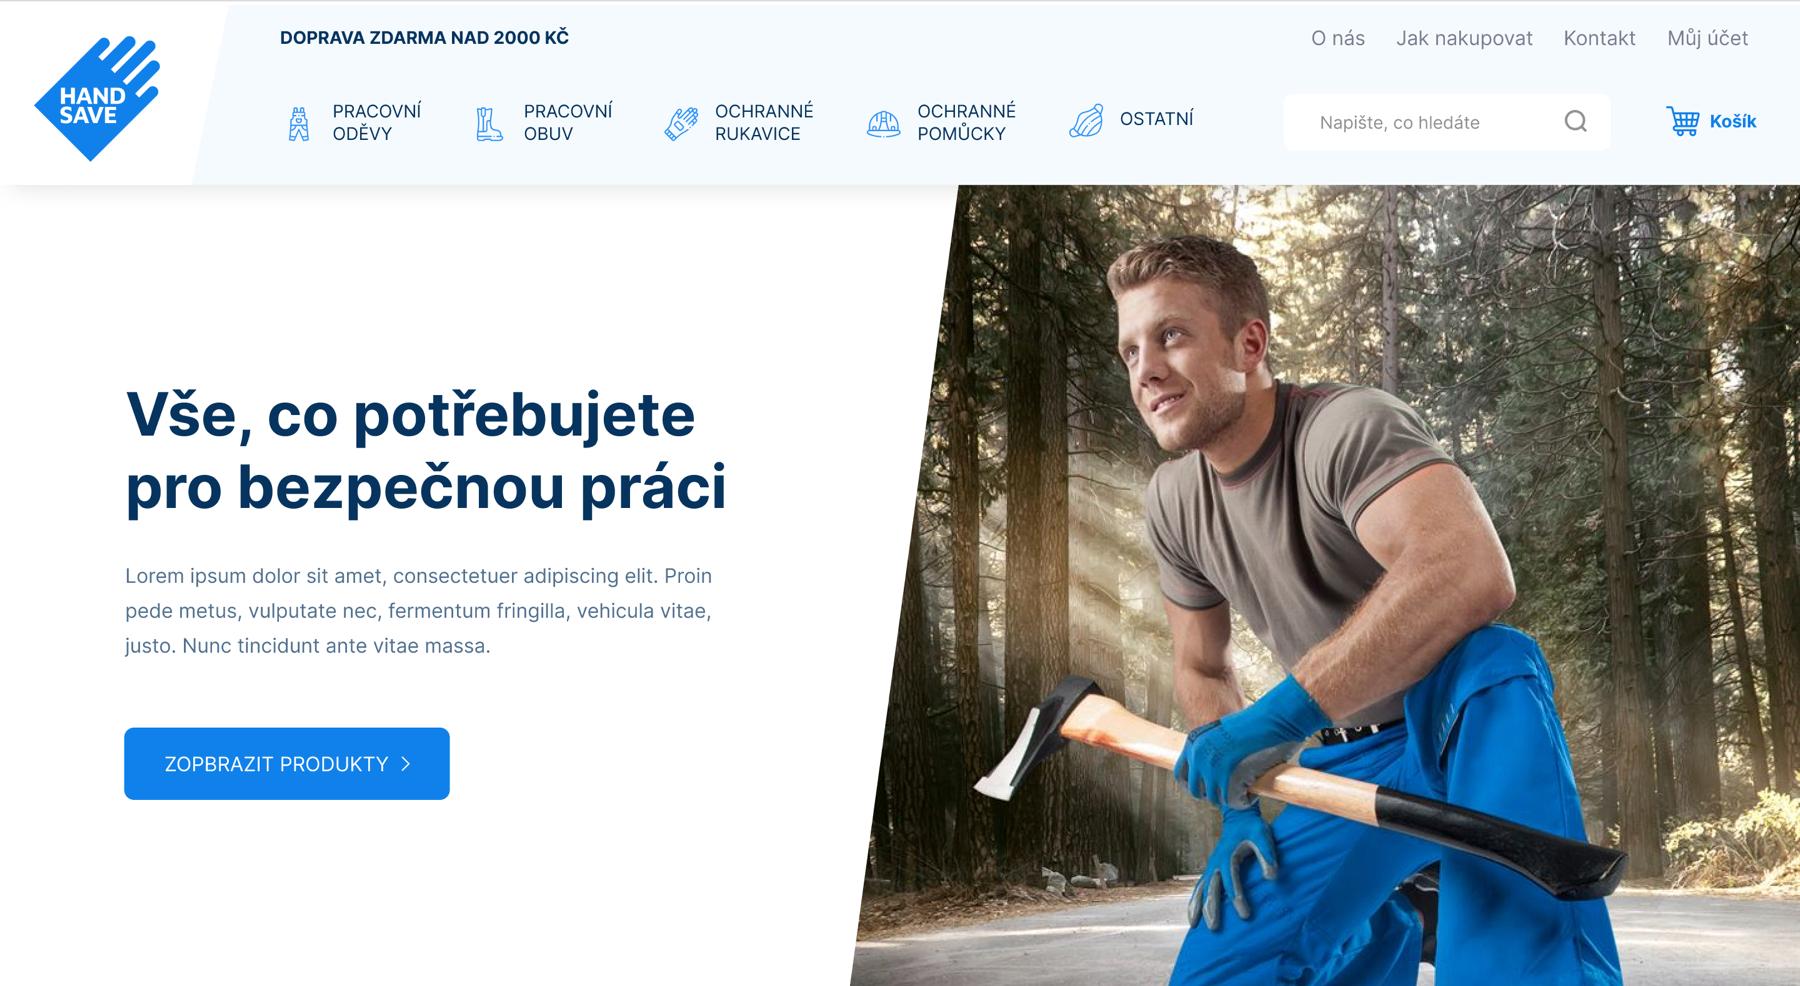 Shapito - handsave.cz